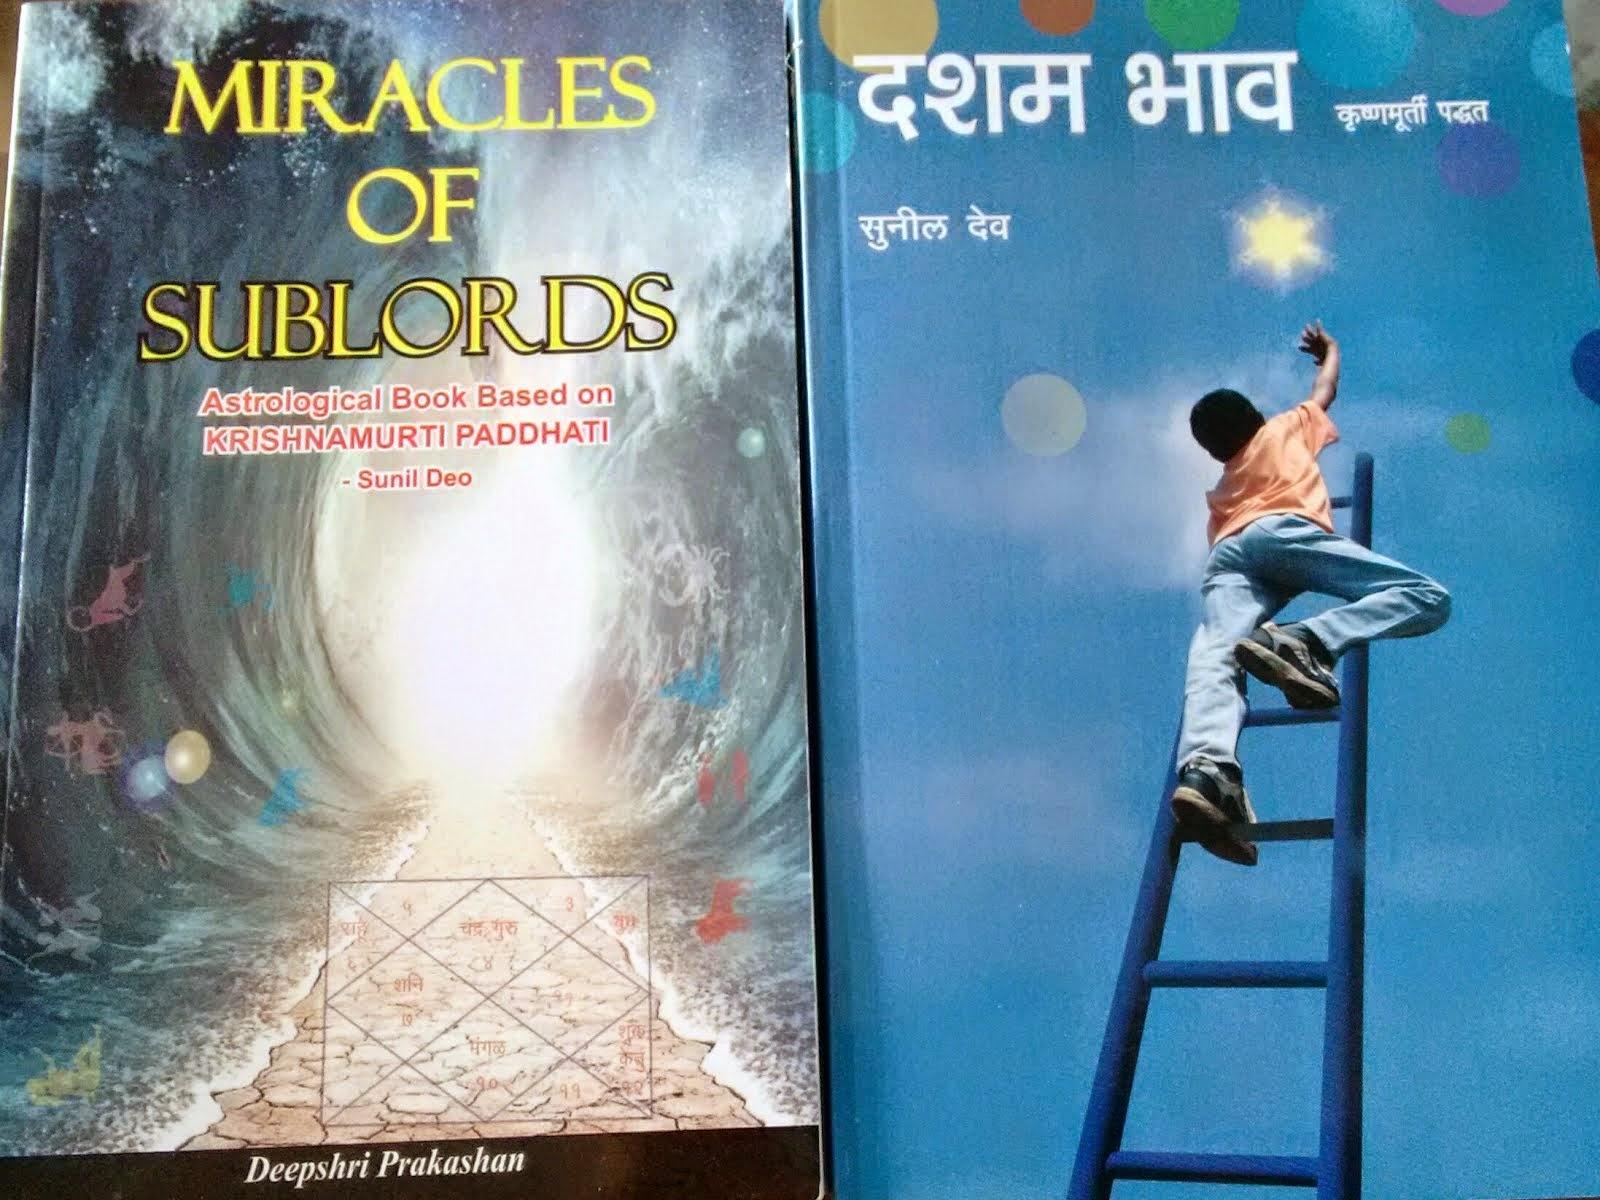 Sunil Deo's books